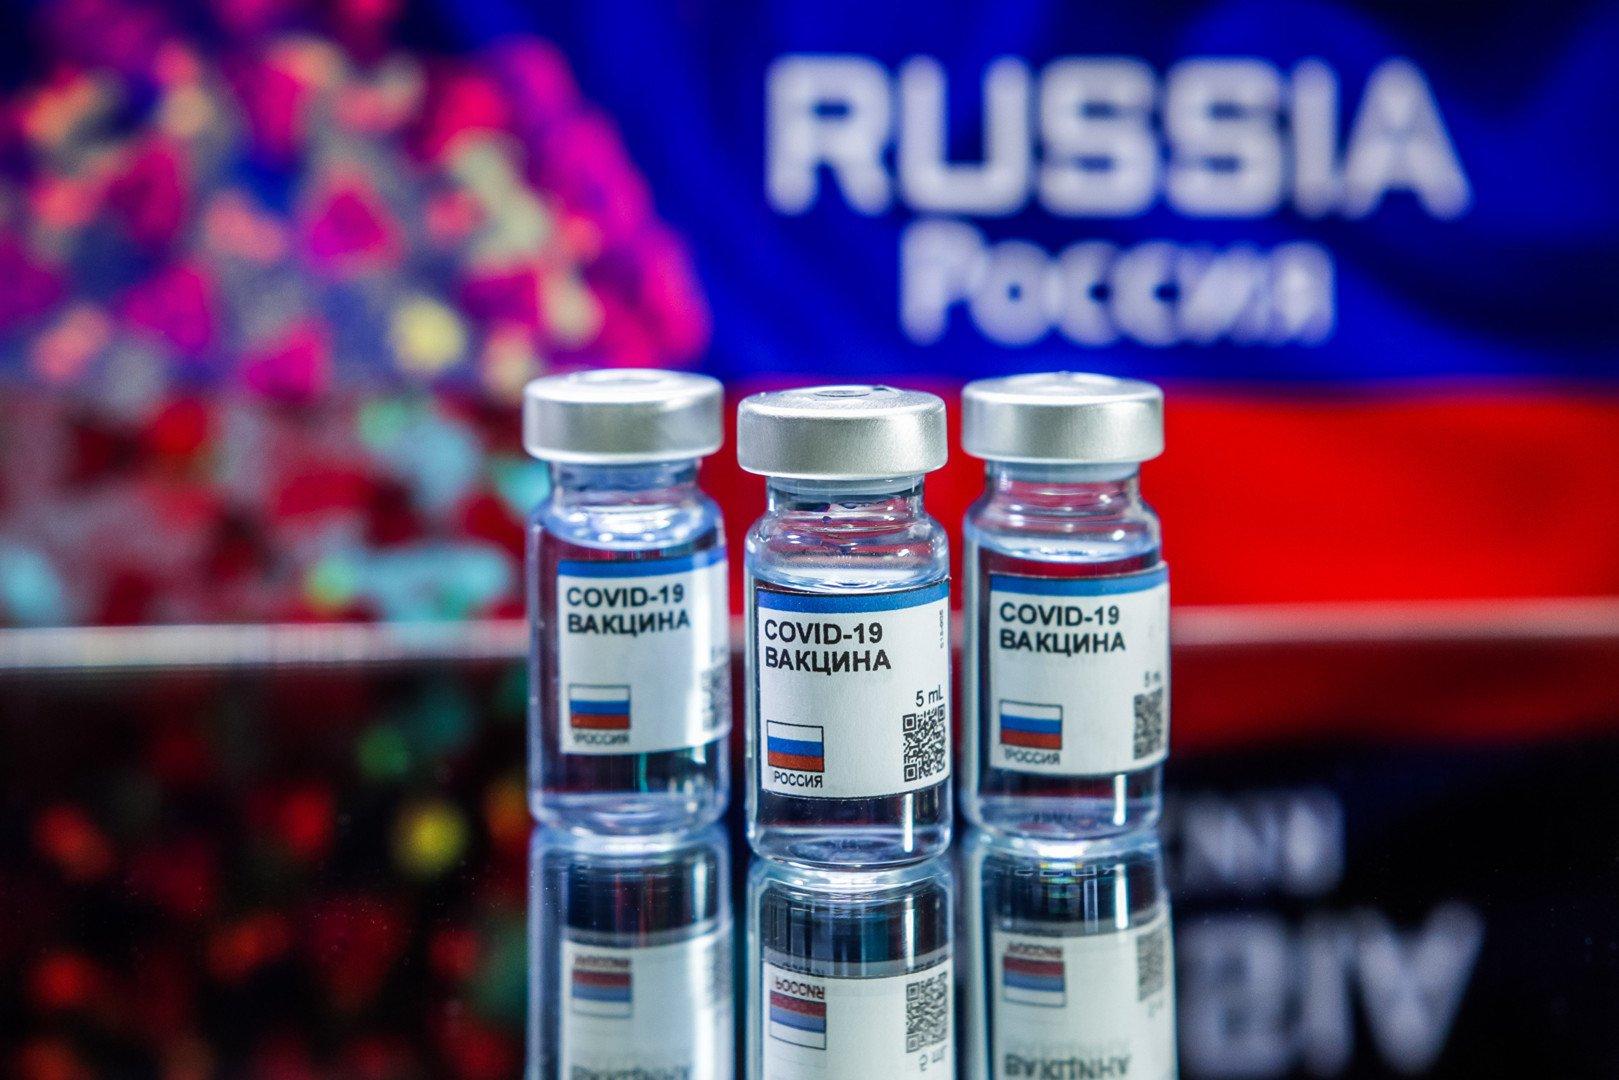 Russia's vaccine diplomacy